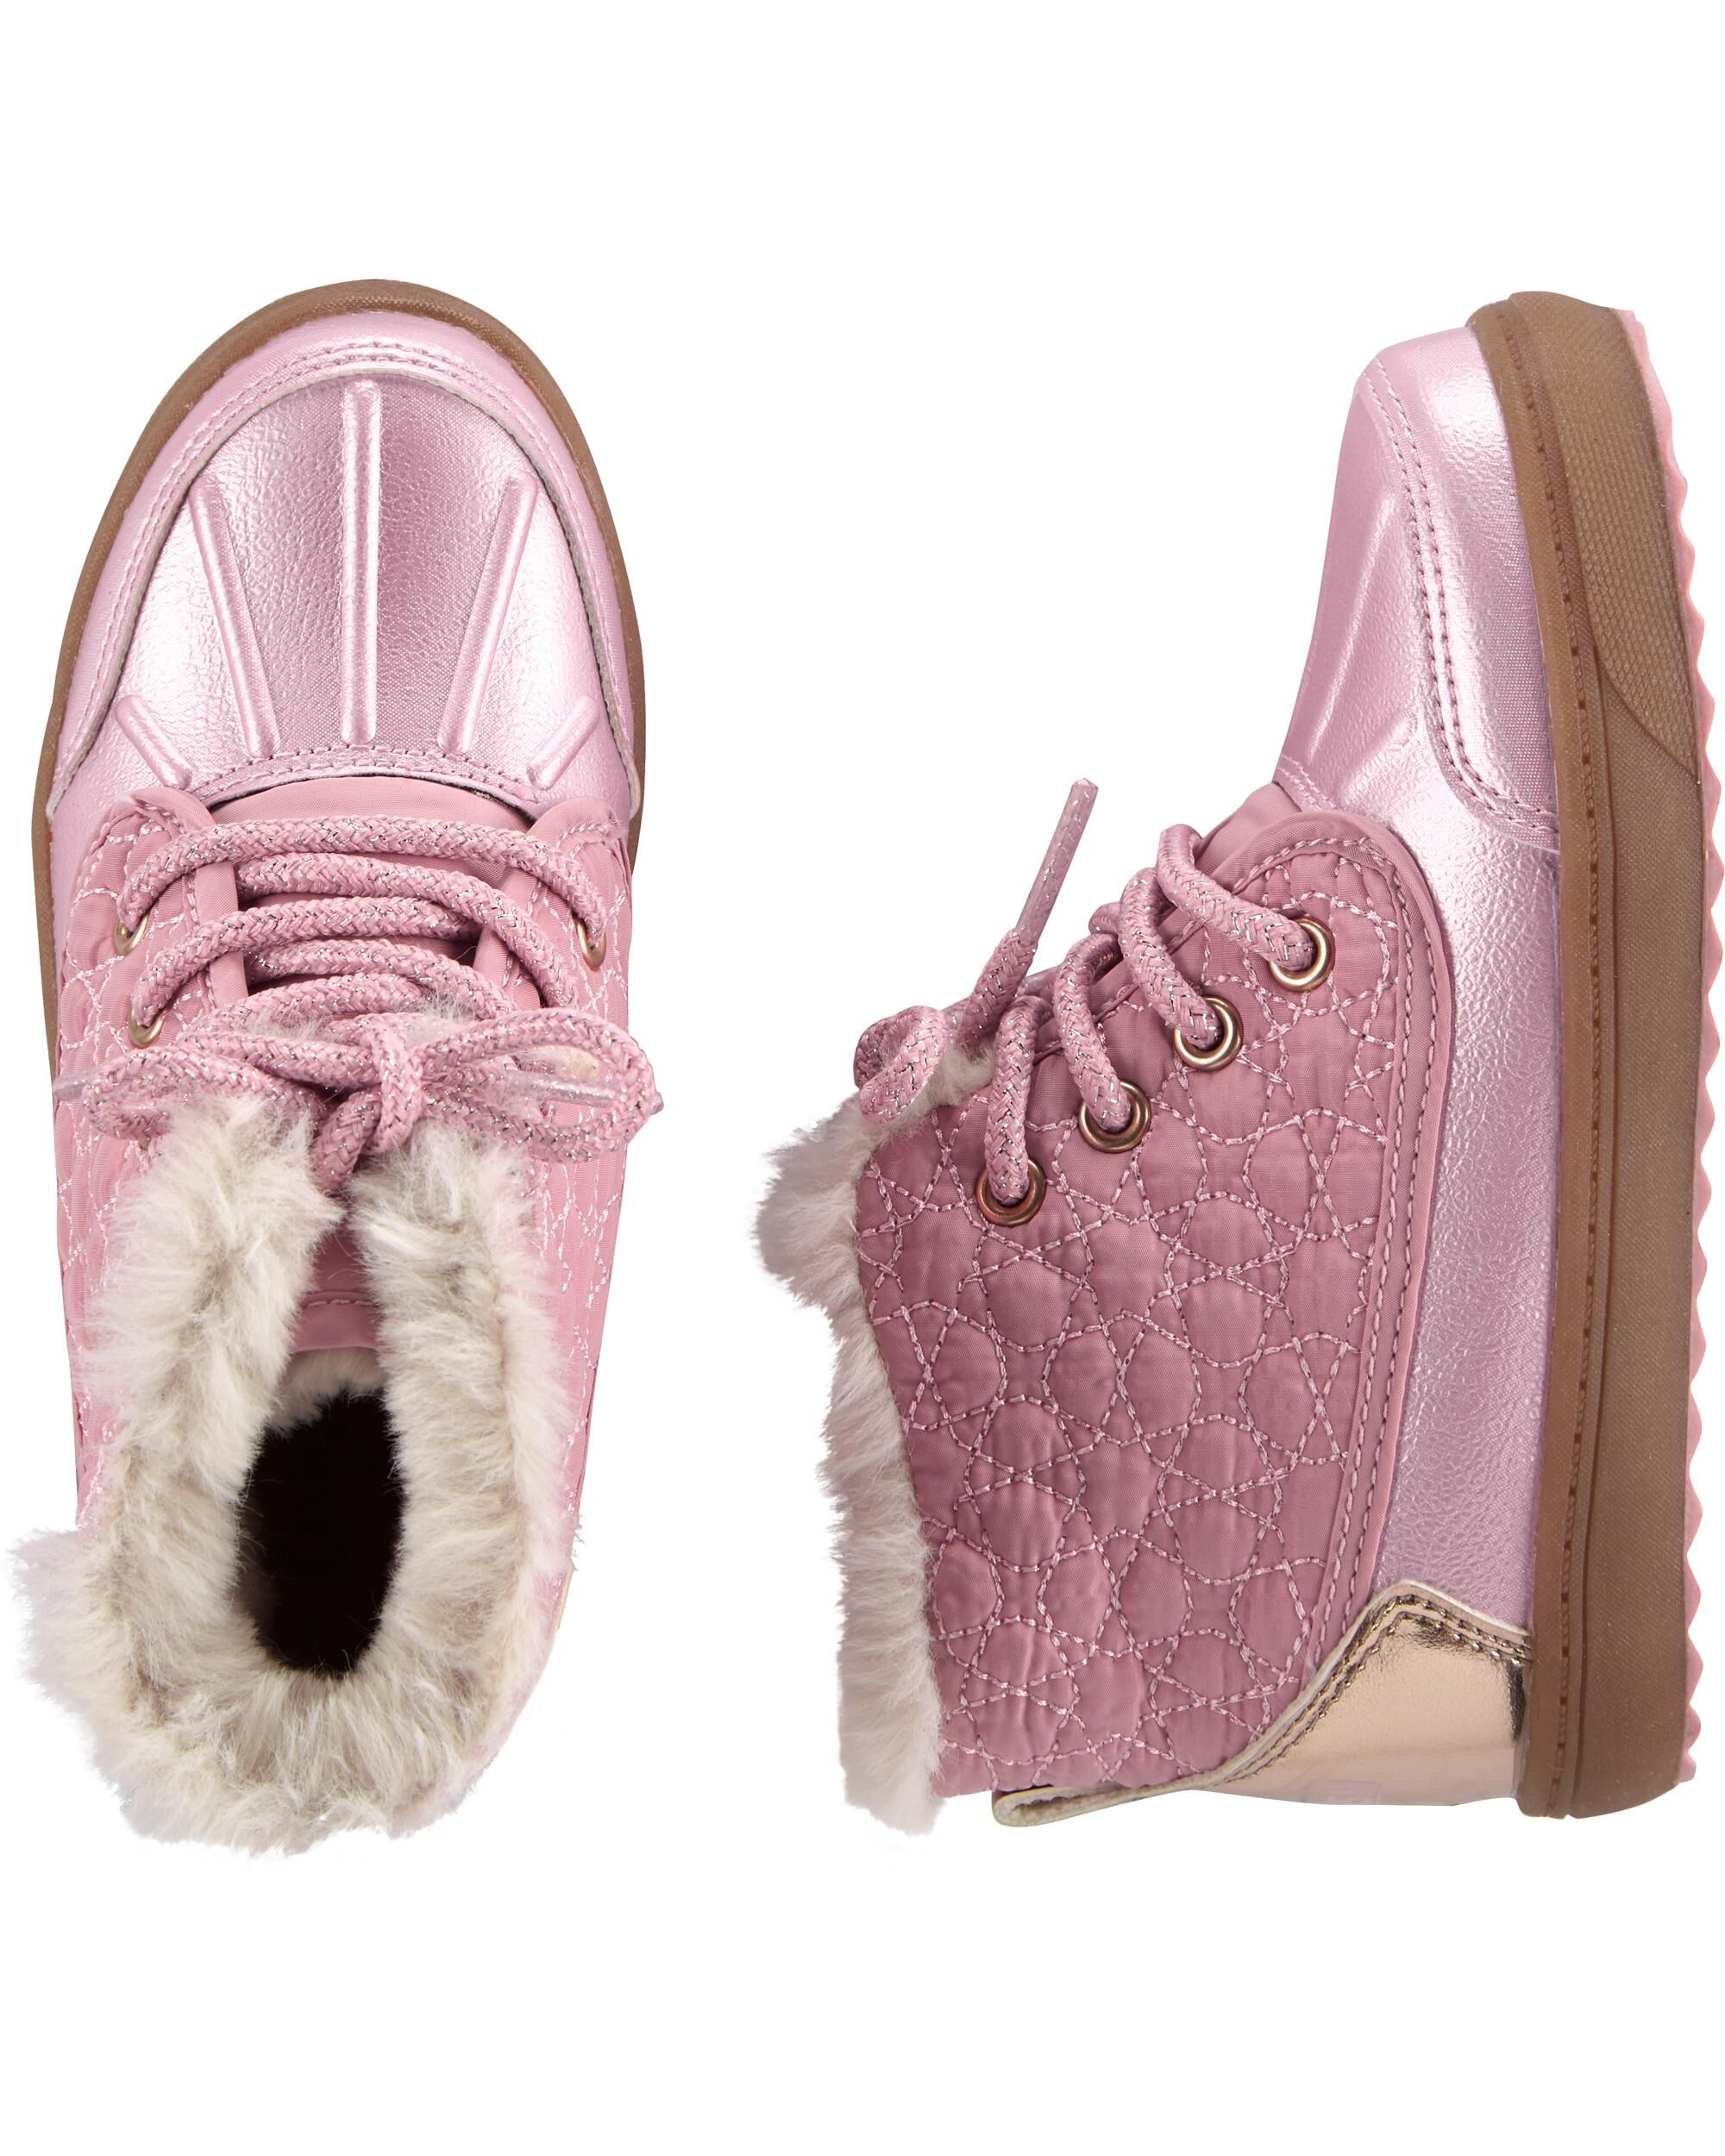 *DOORBUSTER* OshKosh Pink Duck Boots